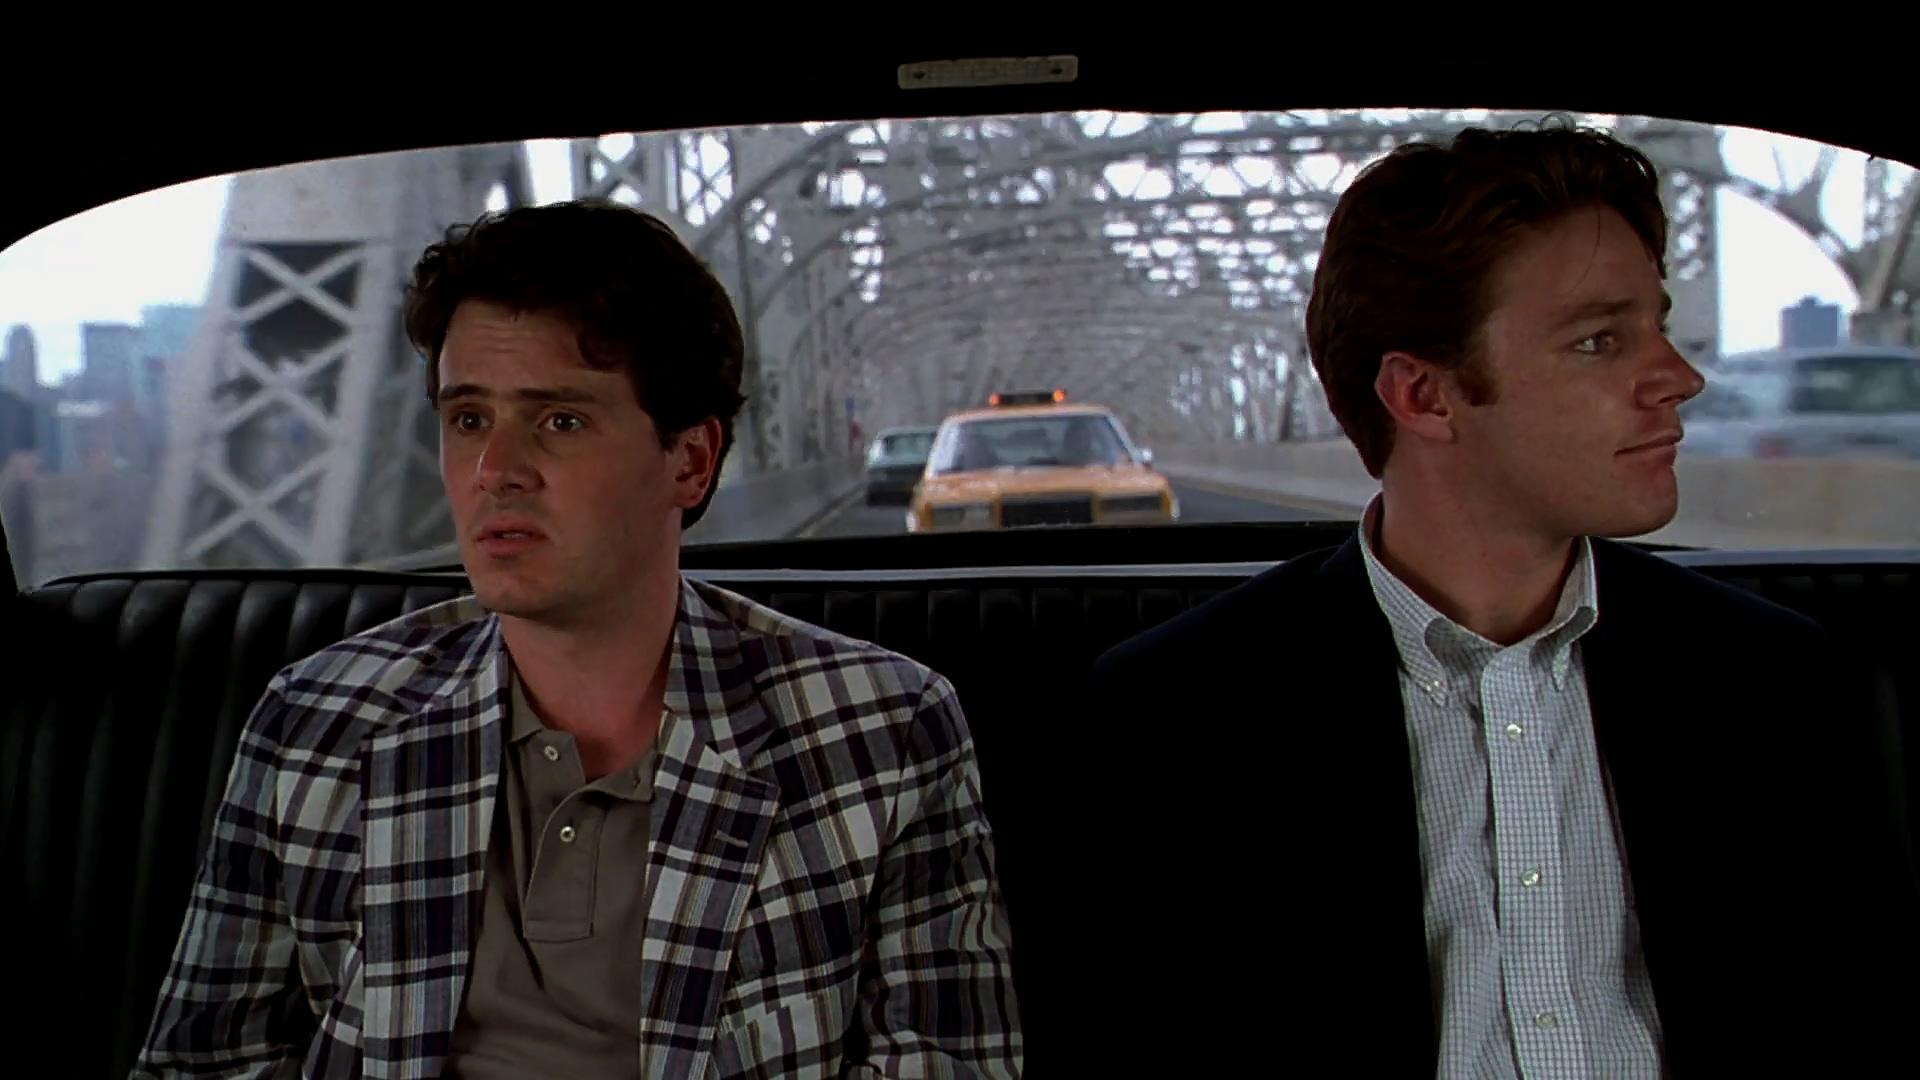 Chris Eigeman and Mackenzie Astin in The Last Days of Disco (1998)